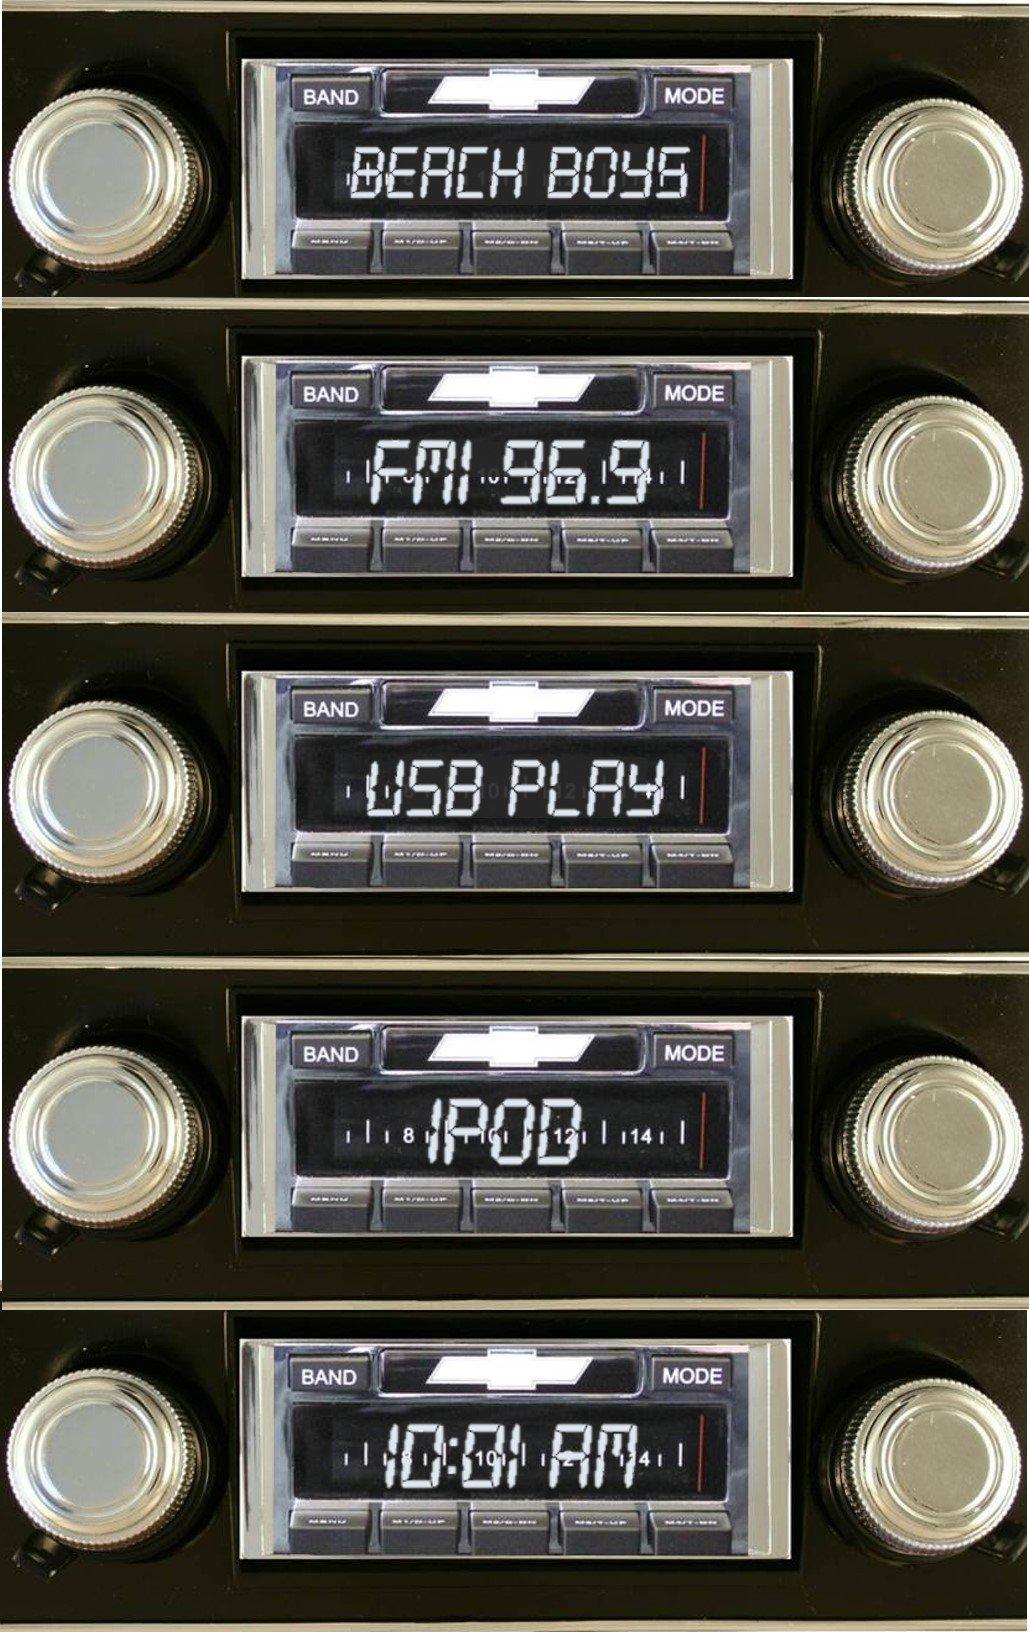 1967-1968 Camaro BLACK Dash USA-630 II High Power 300 watt AM FM Car Stereo/Radio with iPod Docking Cable